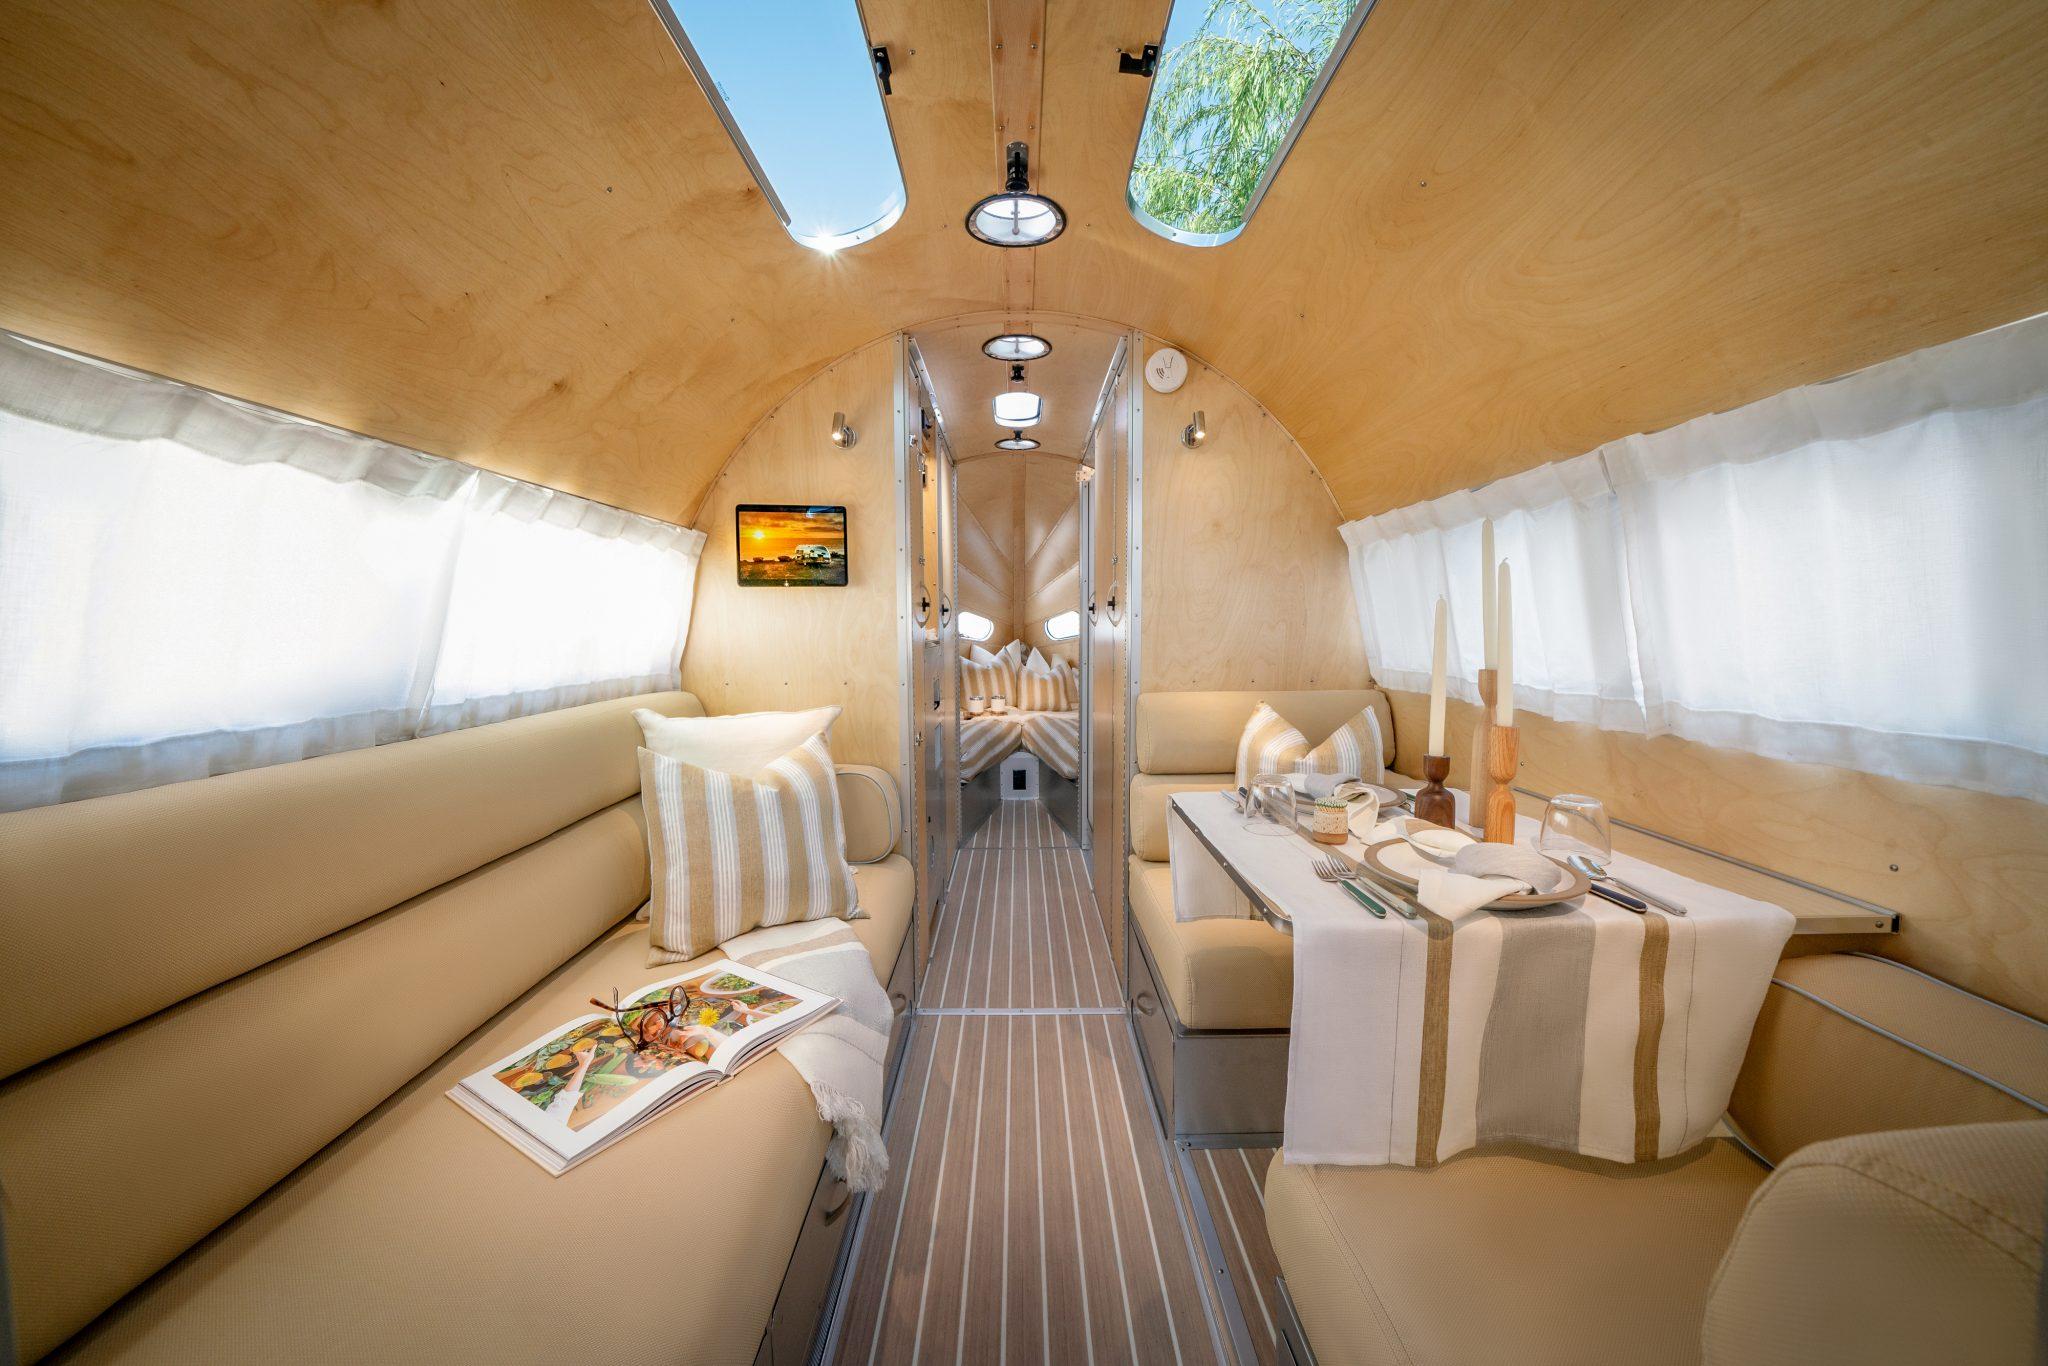 Terra Firma: The Best RV Interior